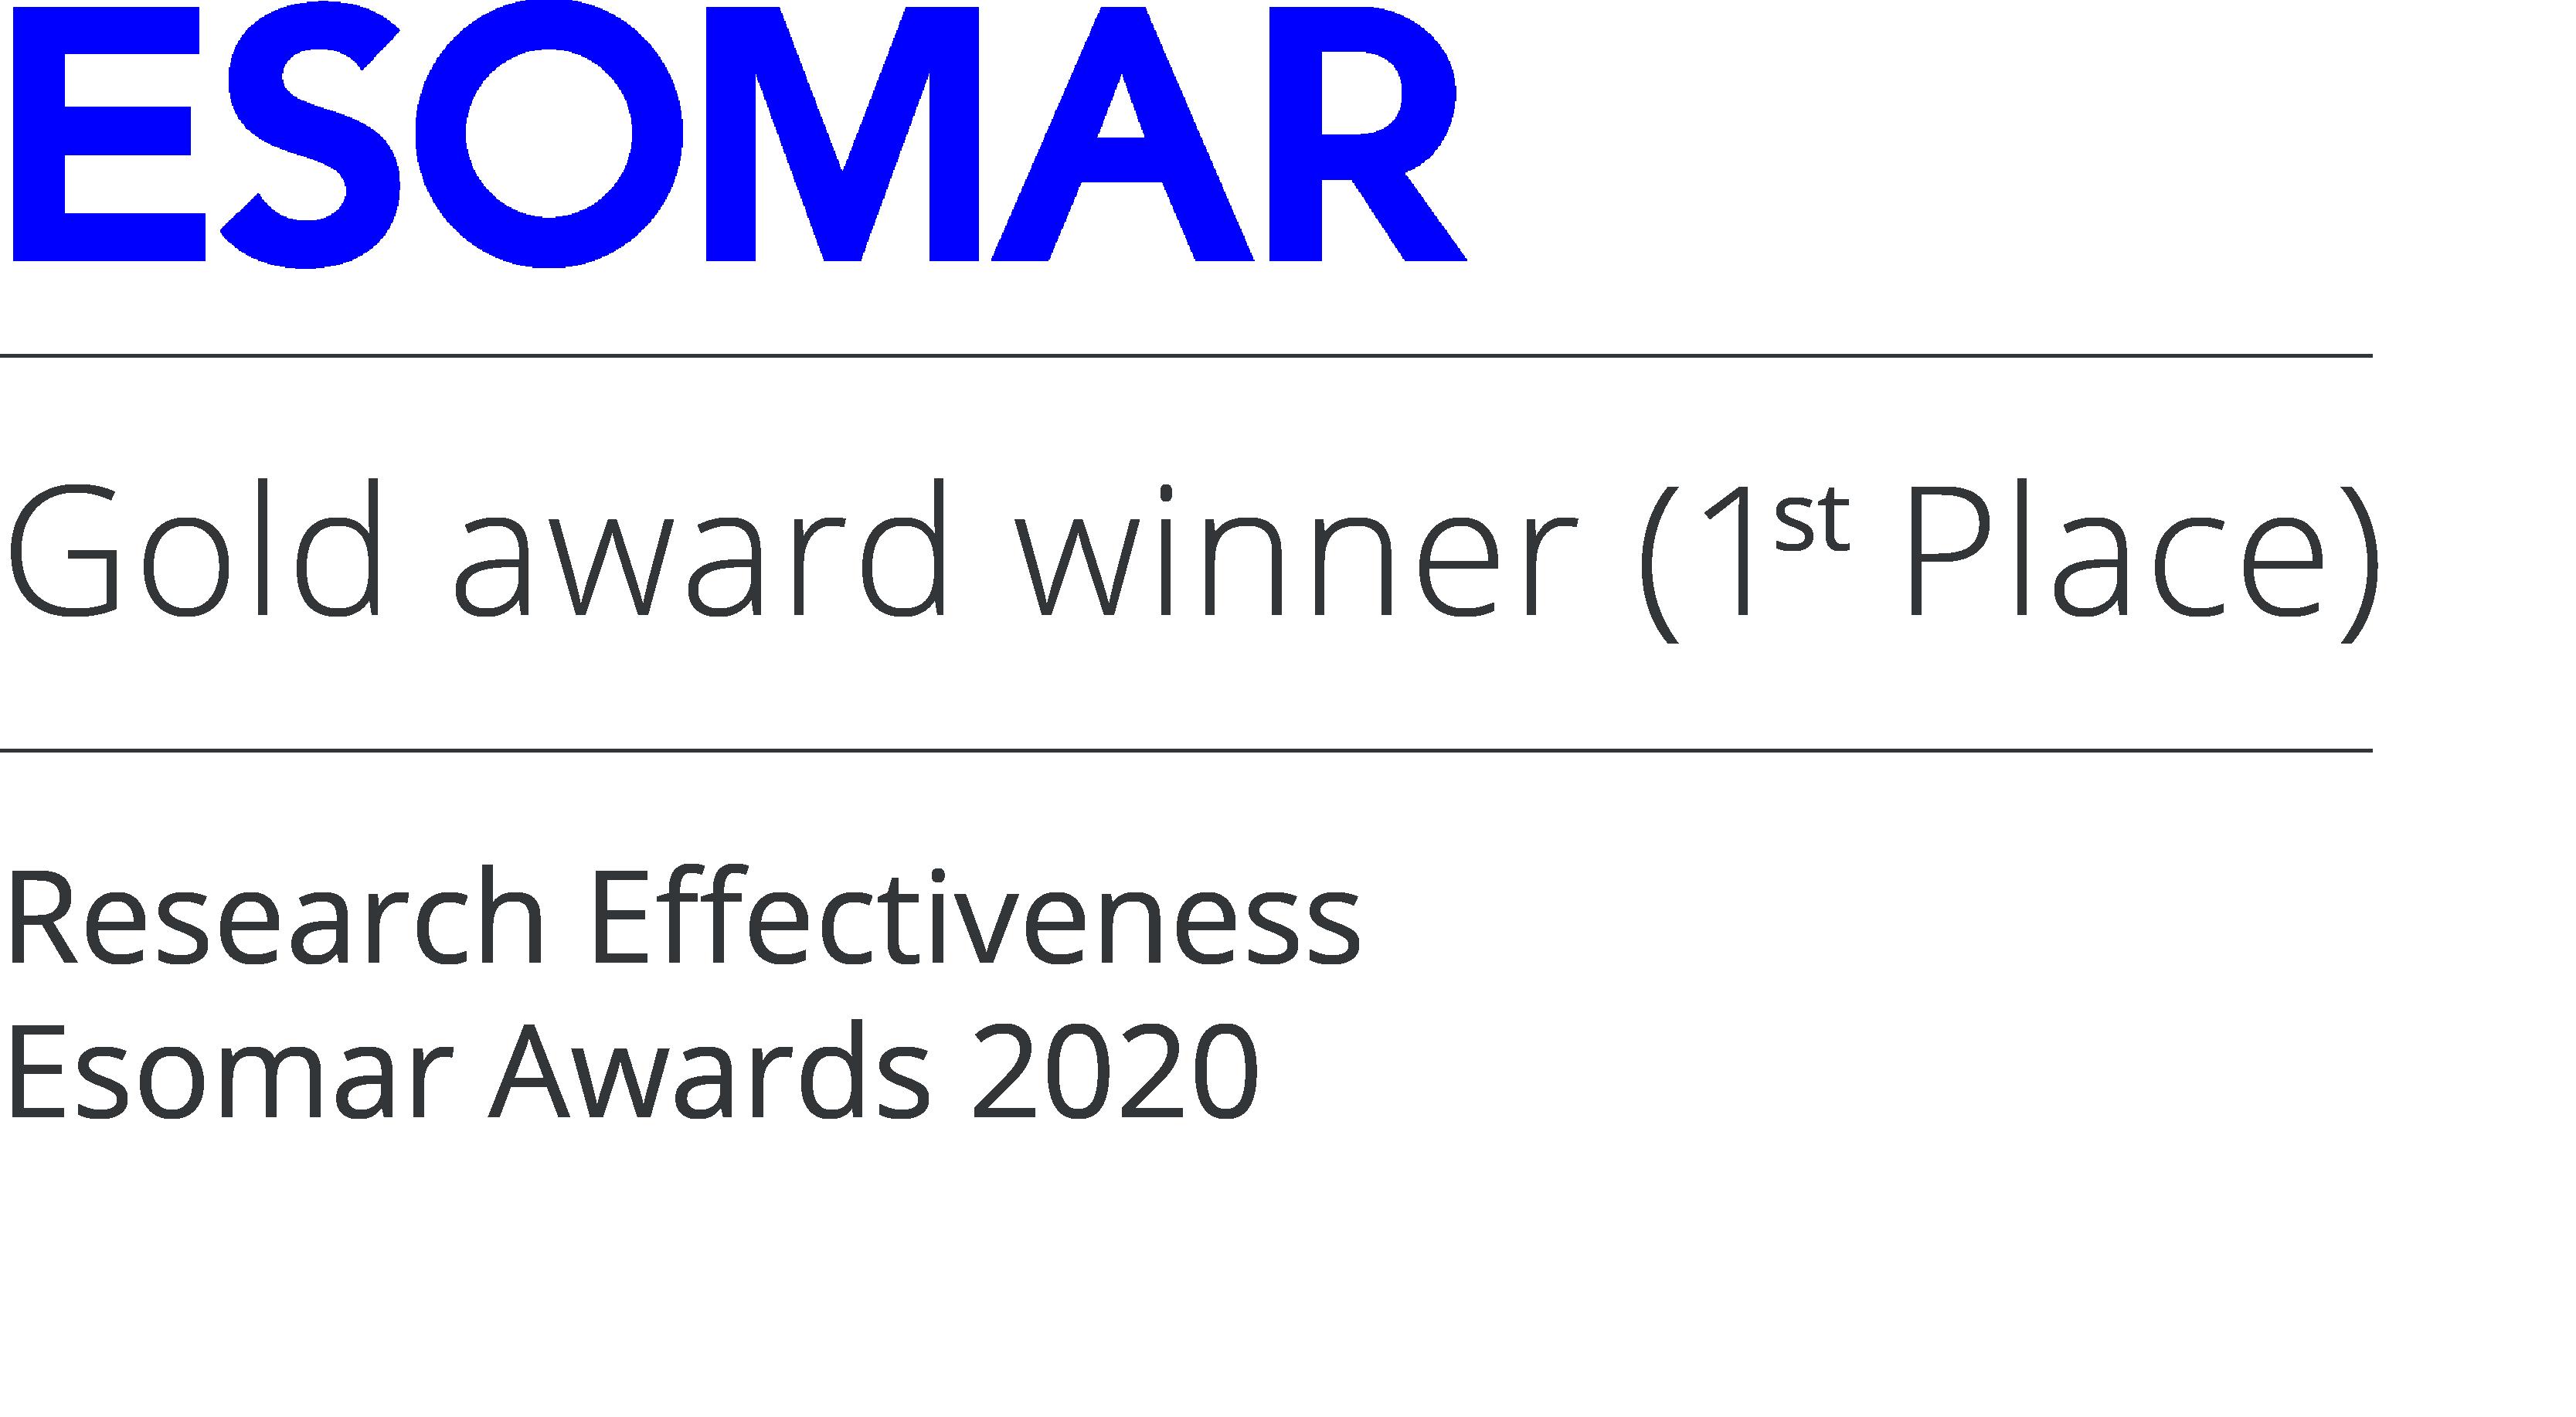 Gold Award Winner for Esomar Research Effectiveness 2020 (Yonder and Formula 1)